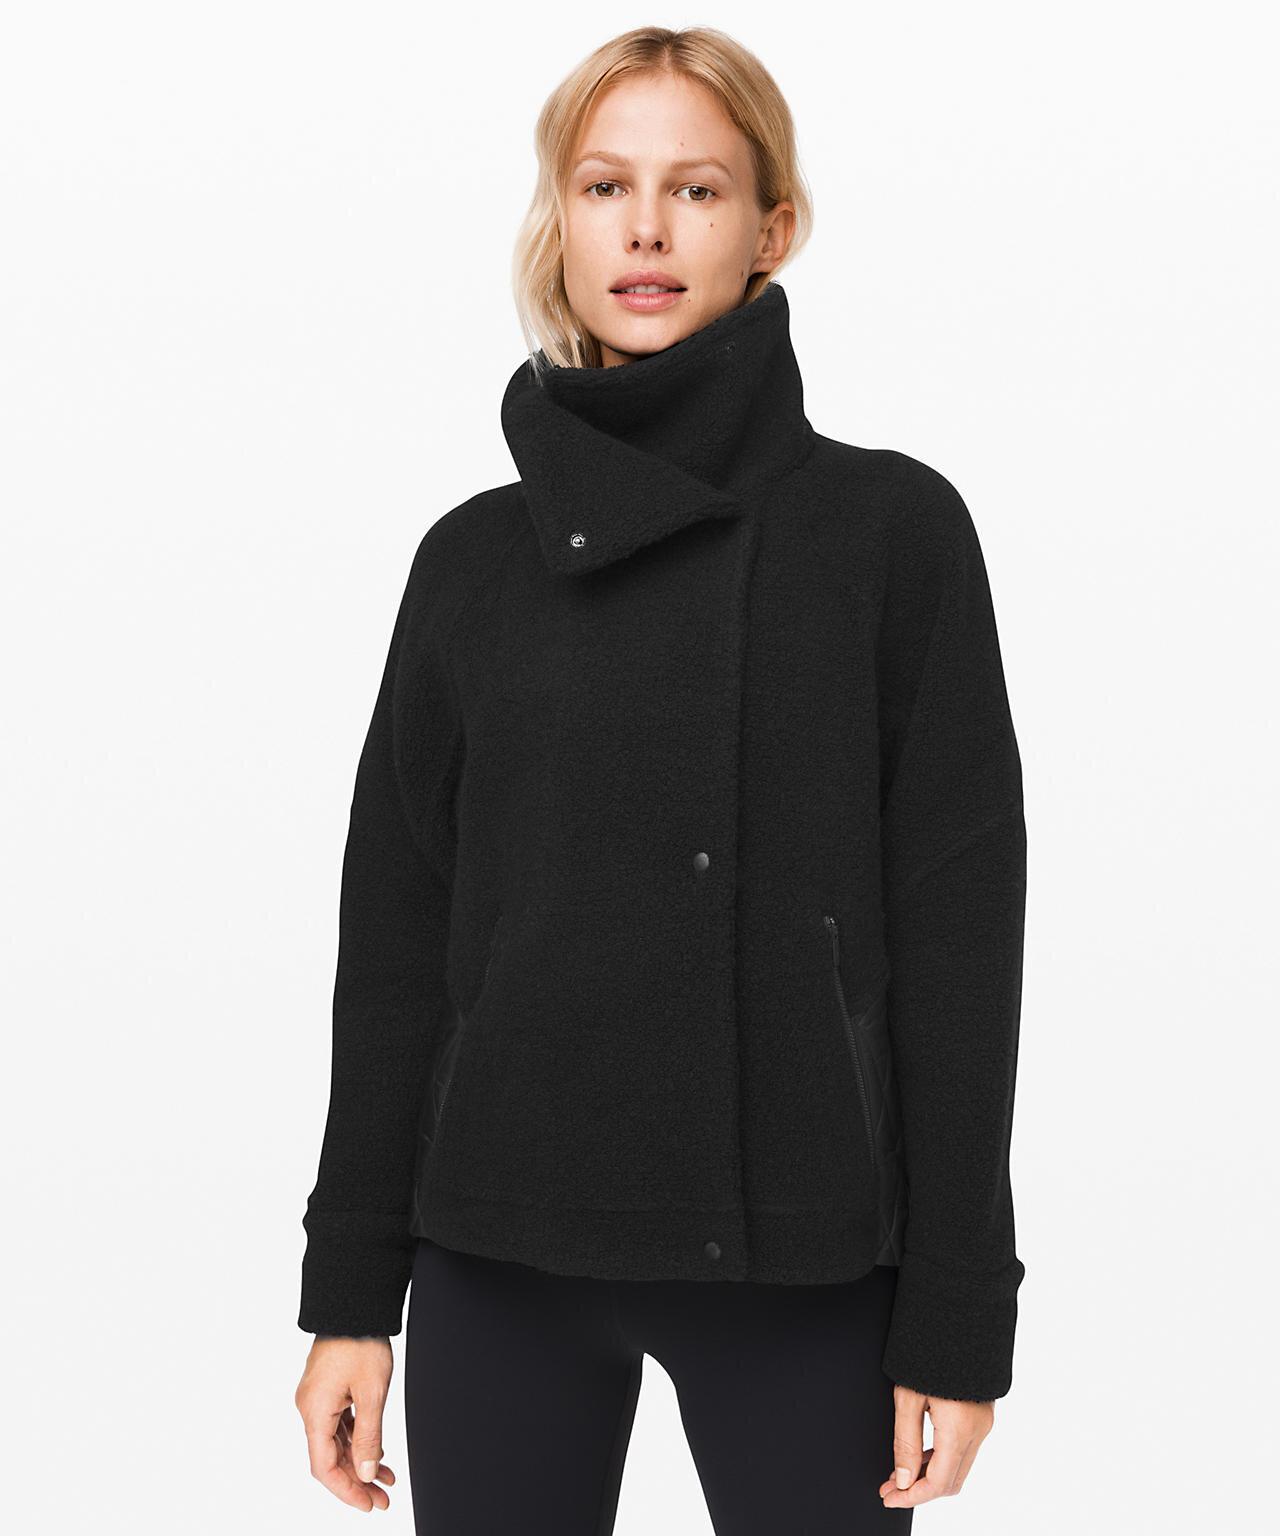 Show Me the Sherpa Jacket